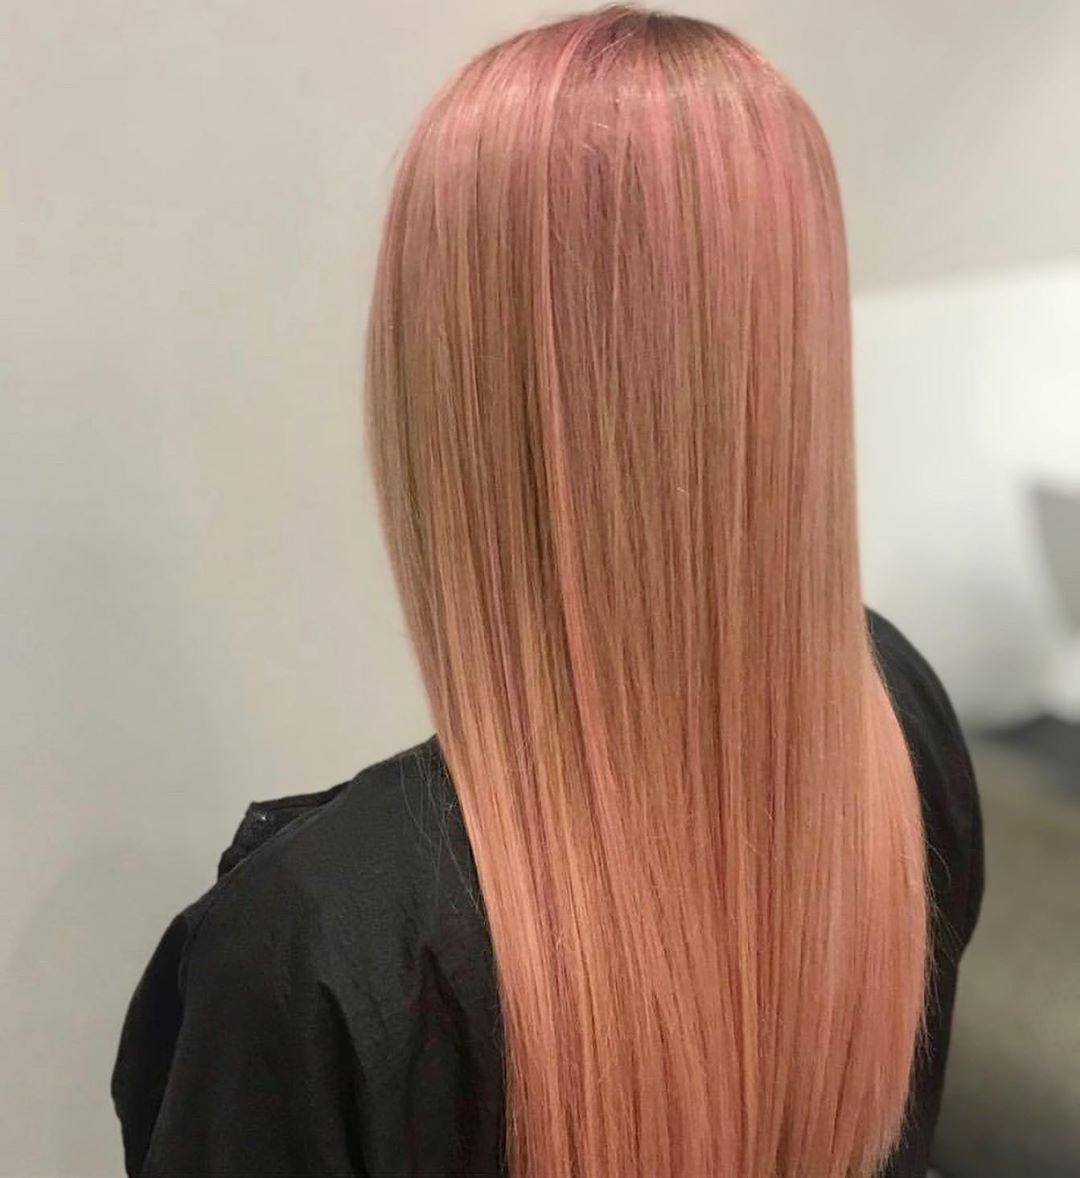 ROSE-GOLD-HAIR-COLOUR-TOP-HAIRDRESSERS-IN-EDINBURGH